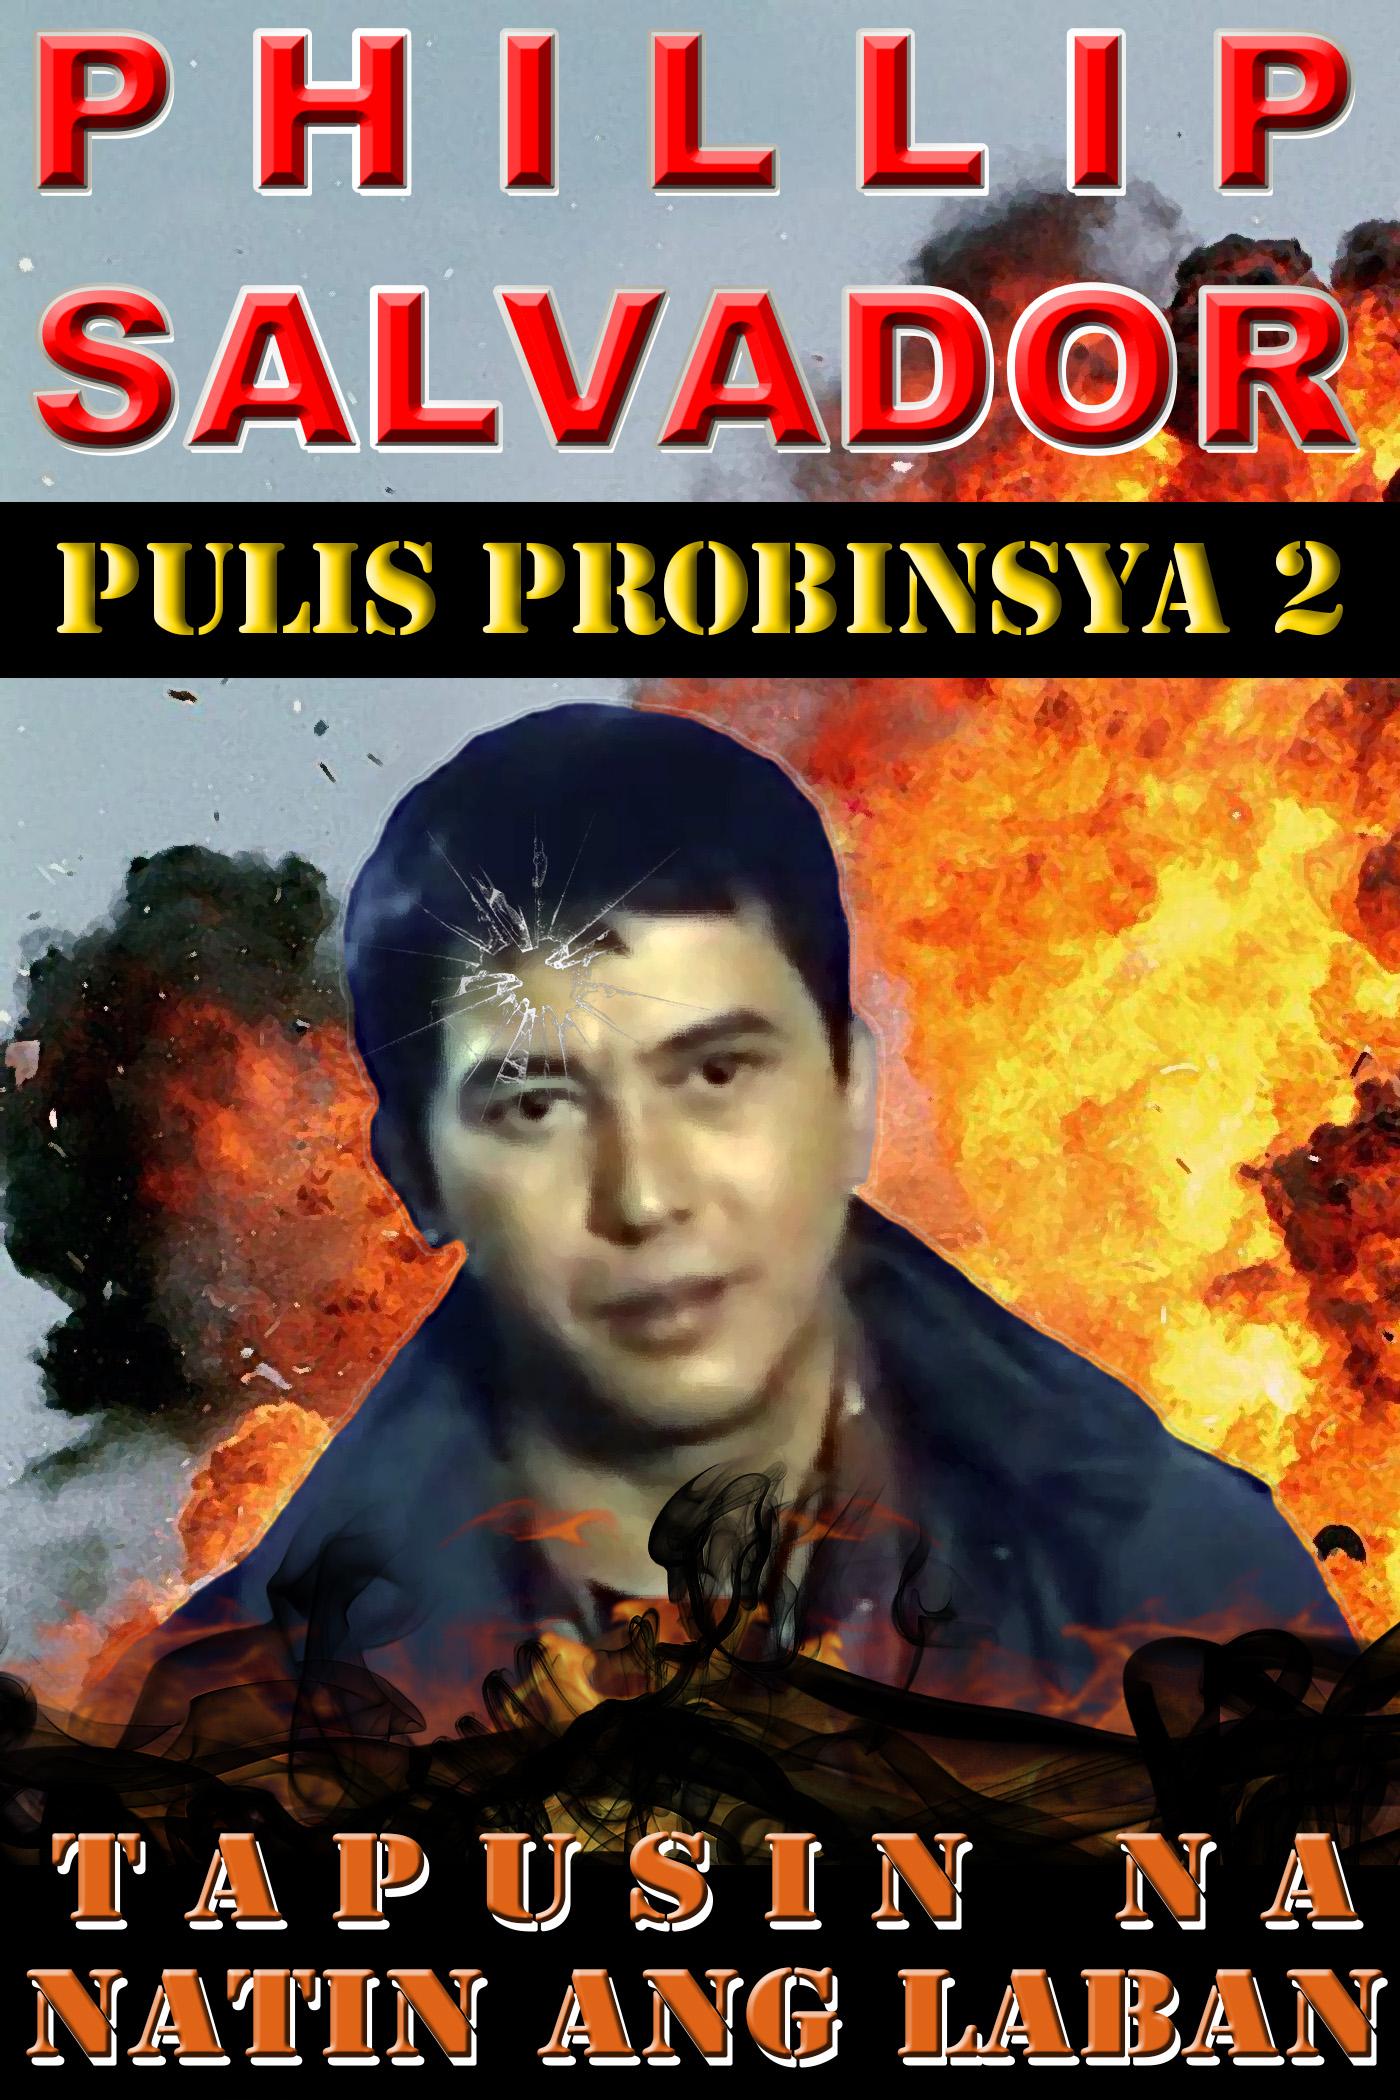 tagalog action movies philip salvador